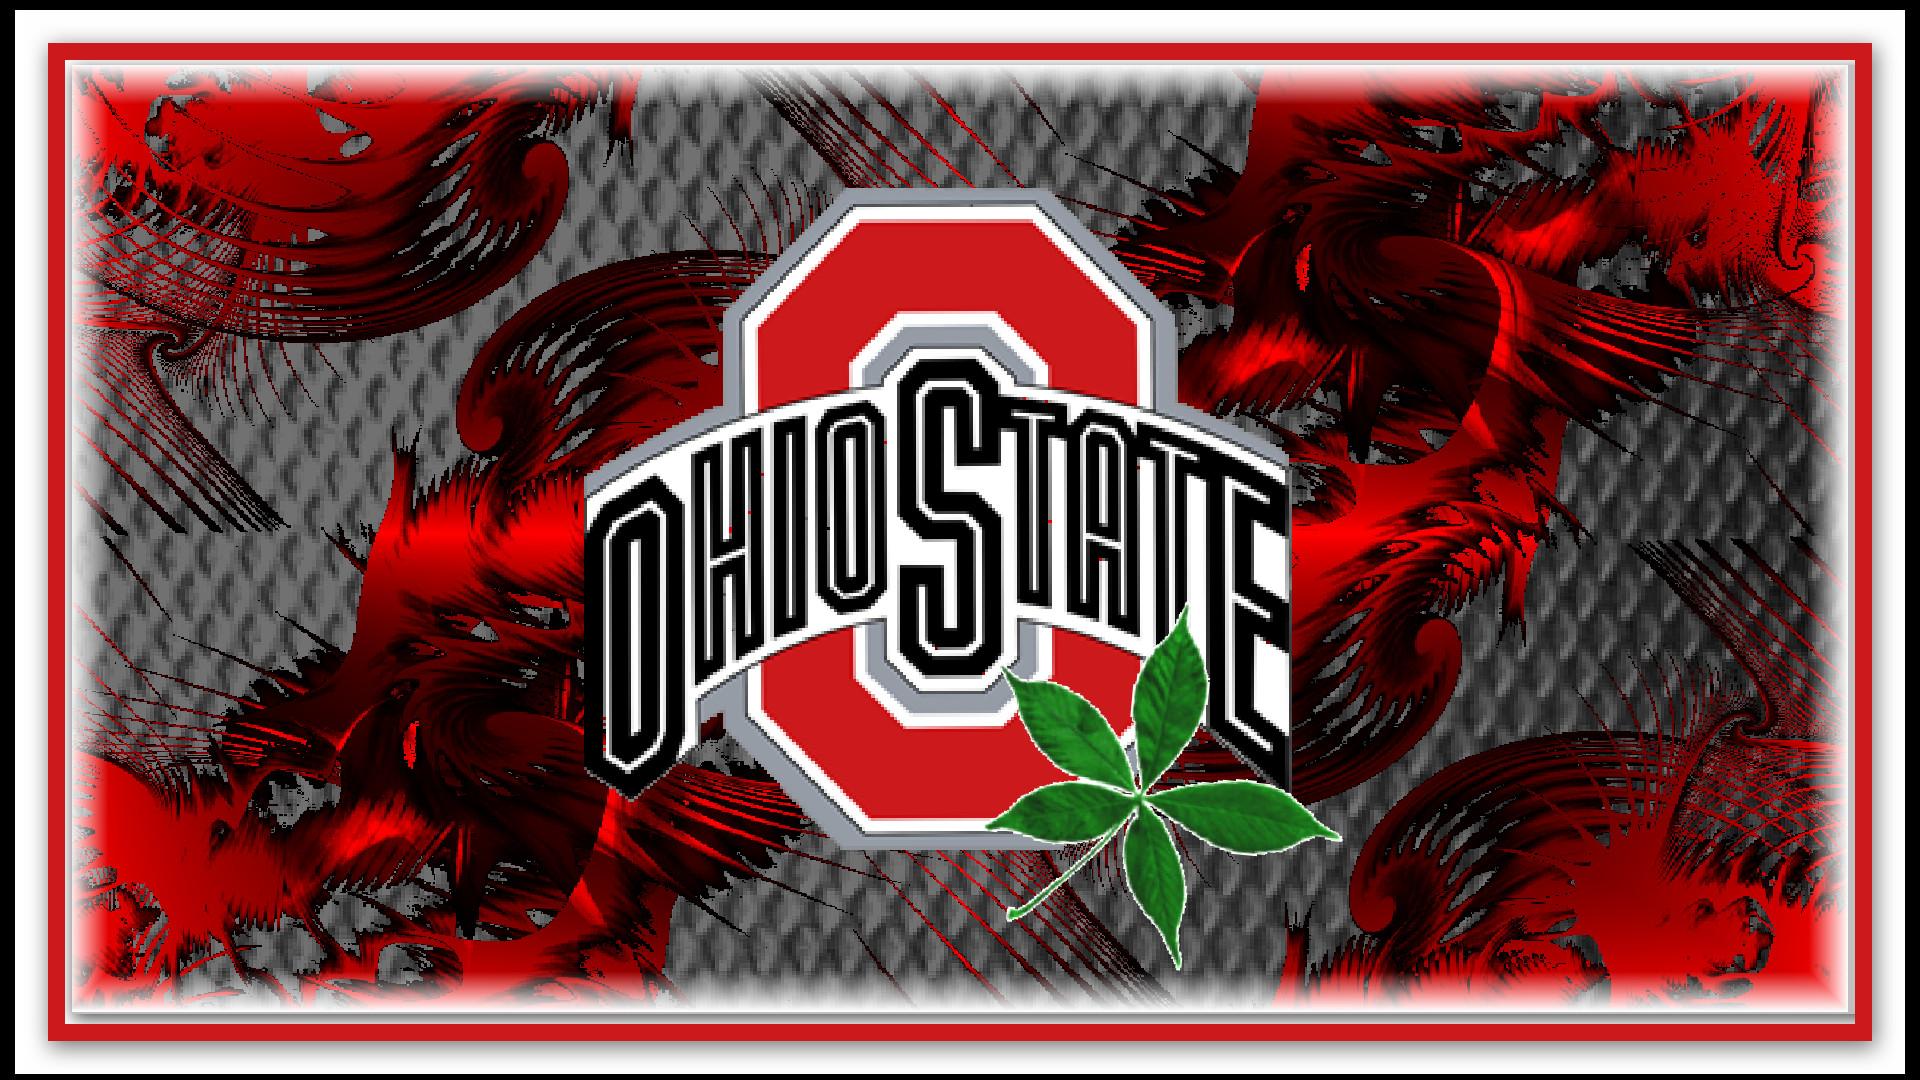 <b>Ohio State</b> Nike Pro Combat Football Uniform – Best